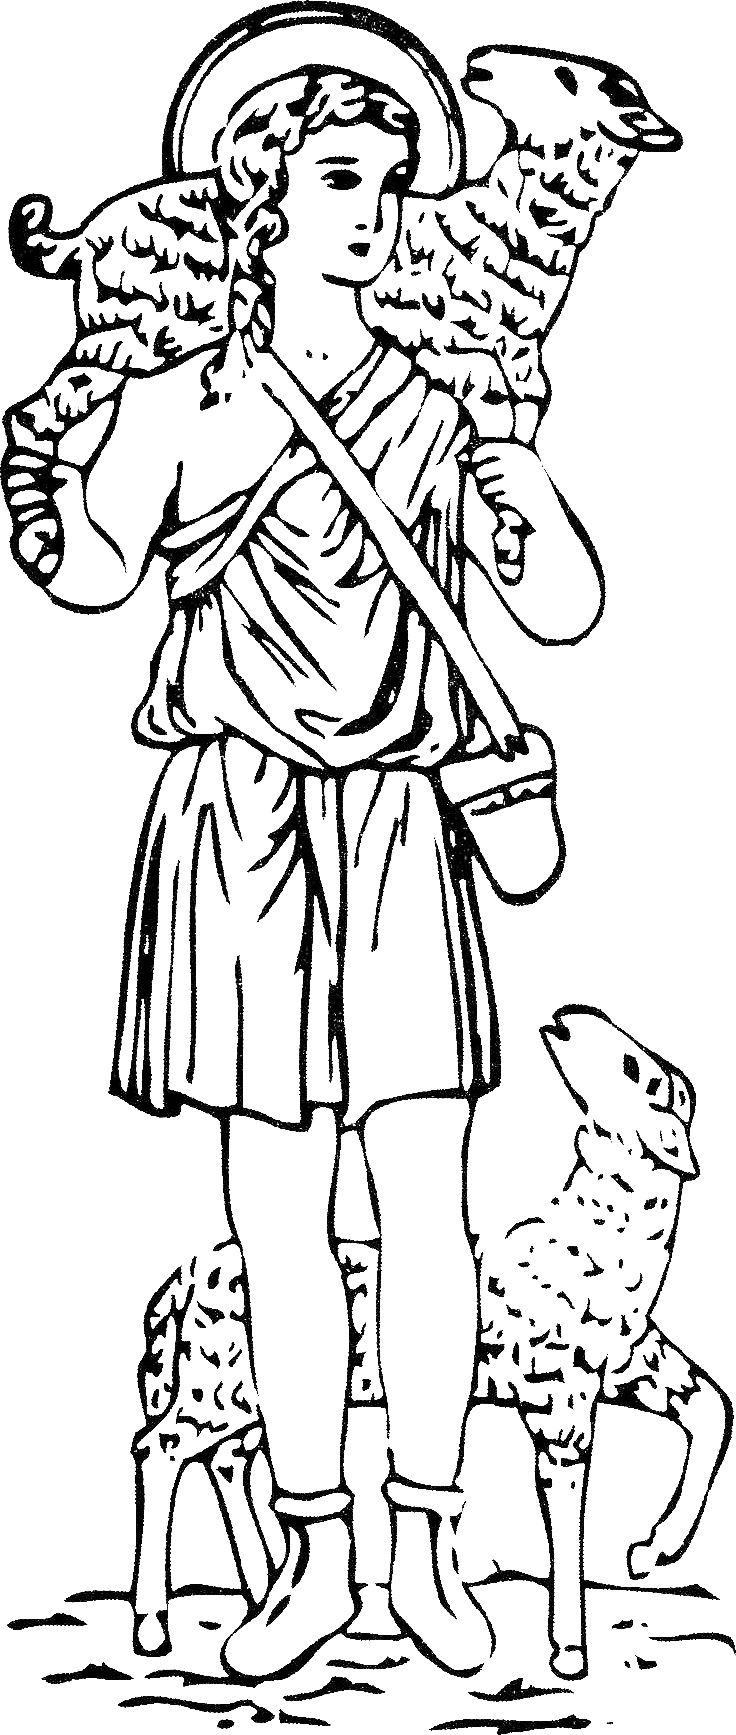 510 best images about catholic line art on pinterest